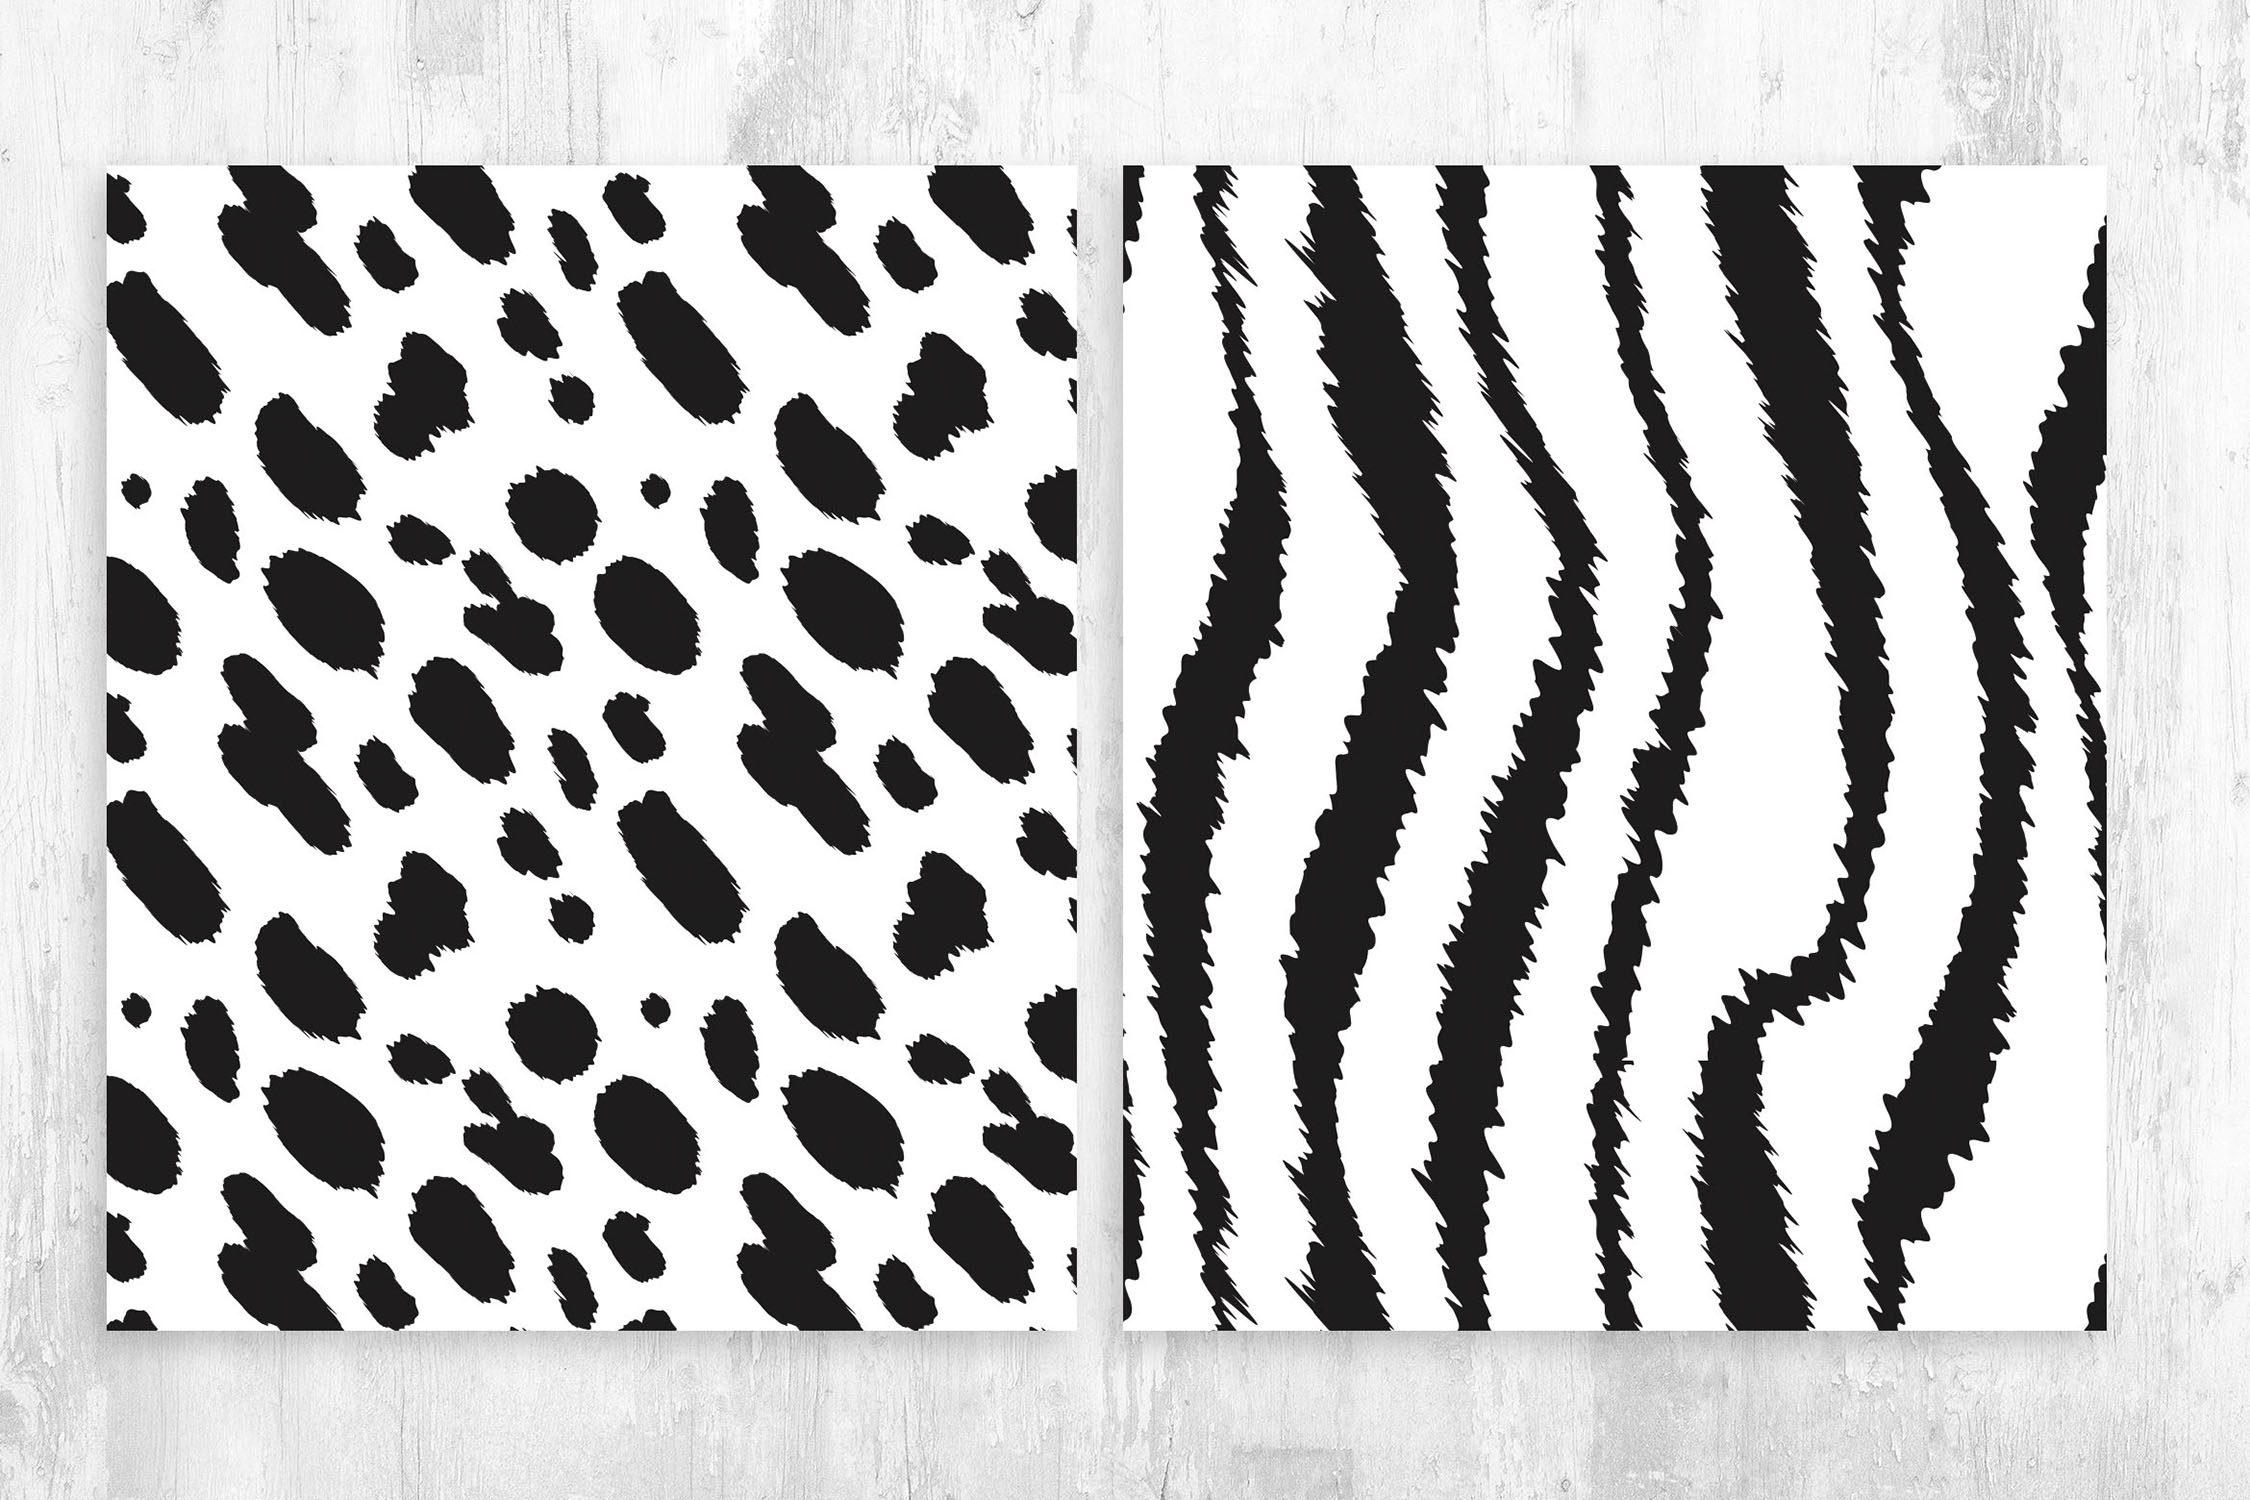 Cow & Zebra Skin Patterns for Photoshop & Illustrator